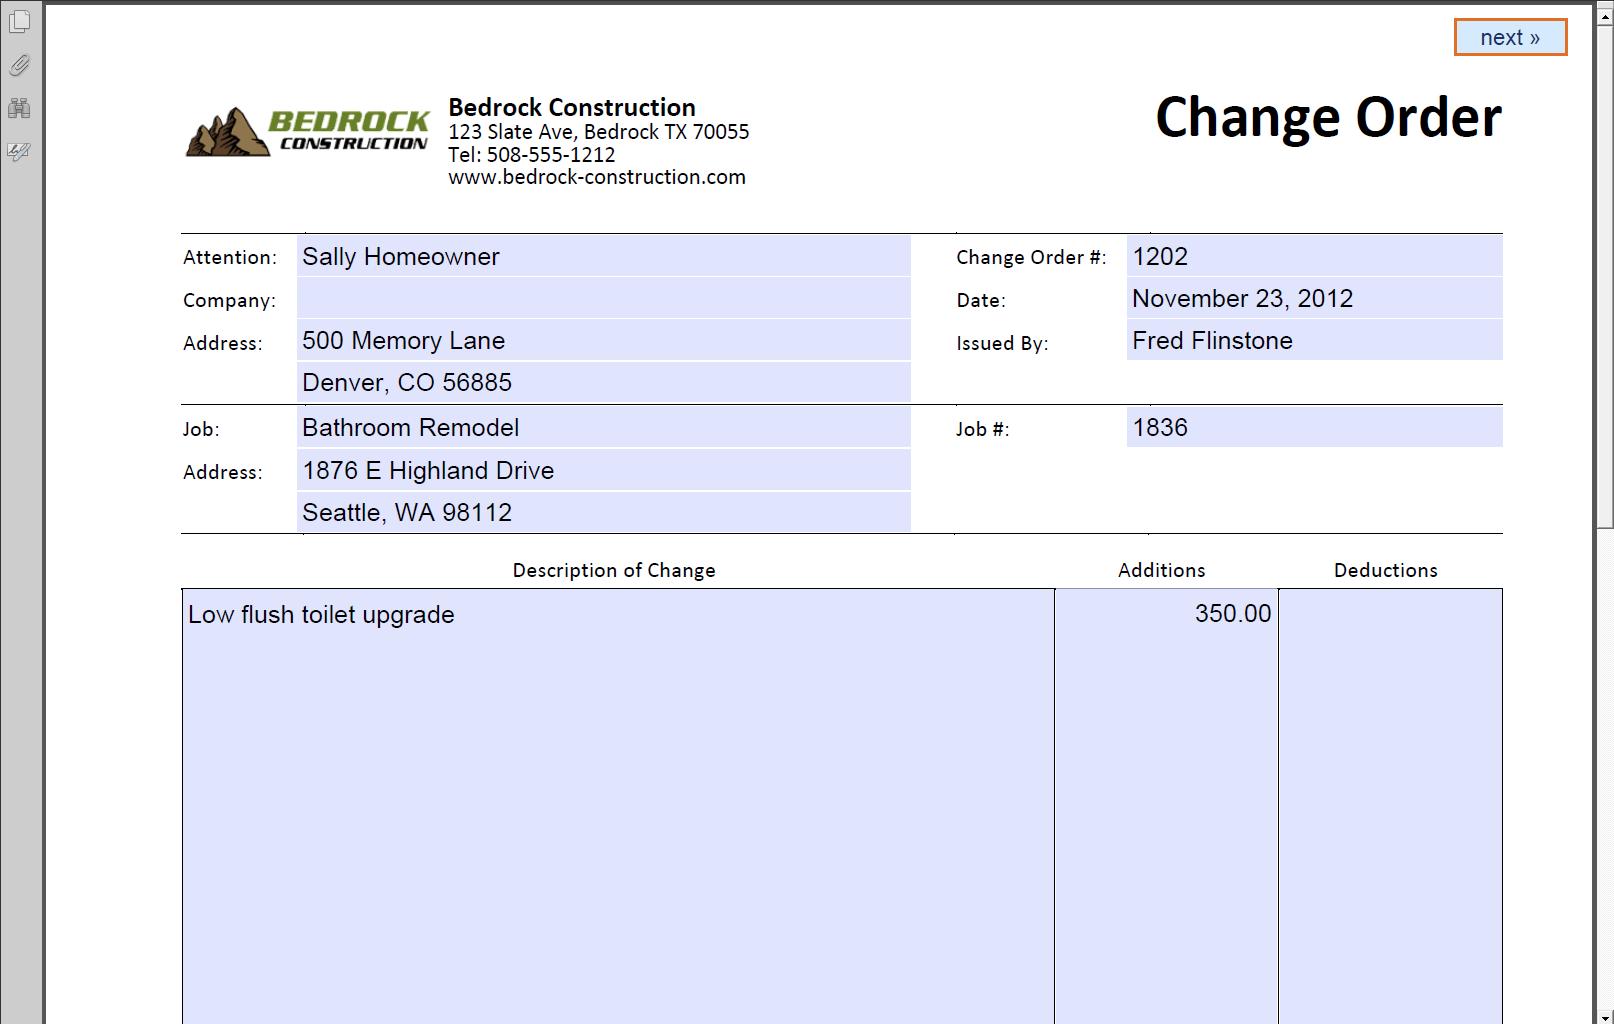 Change order document